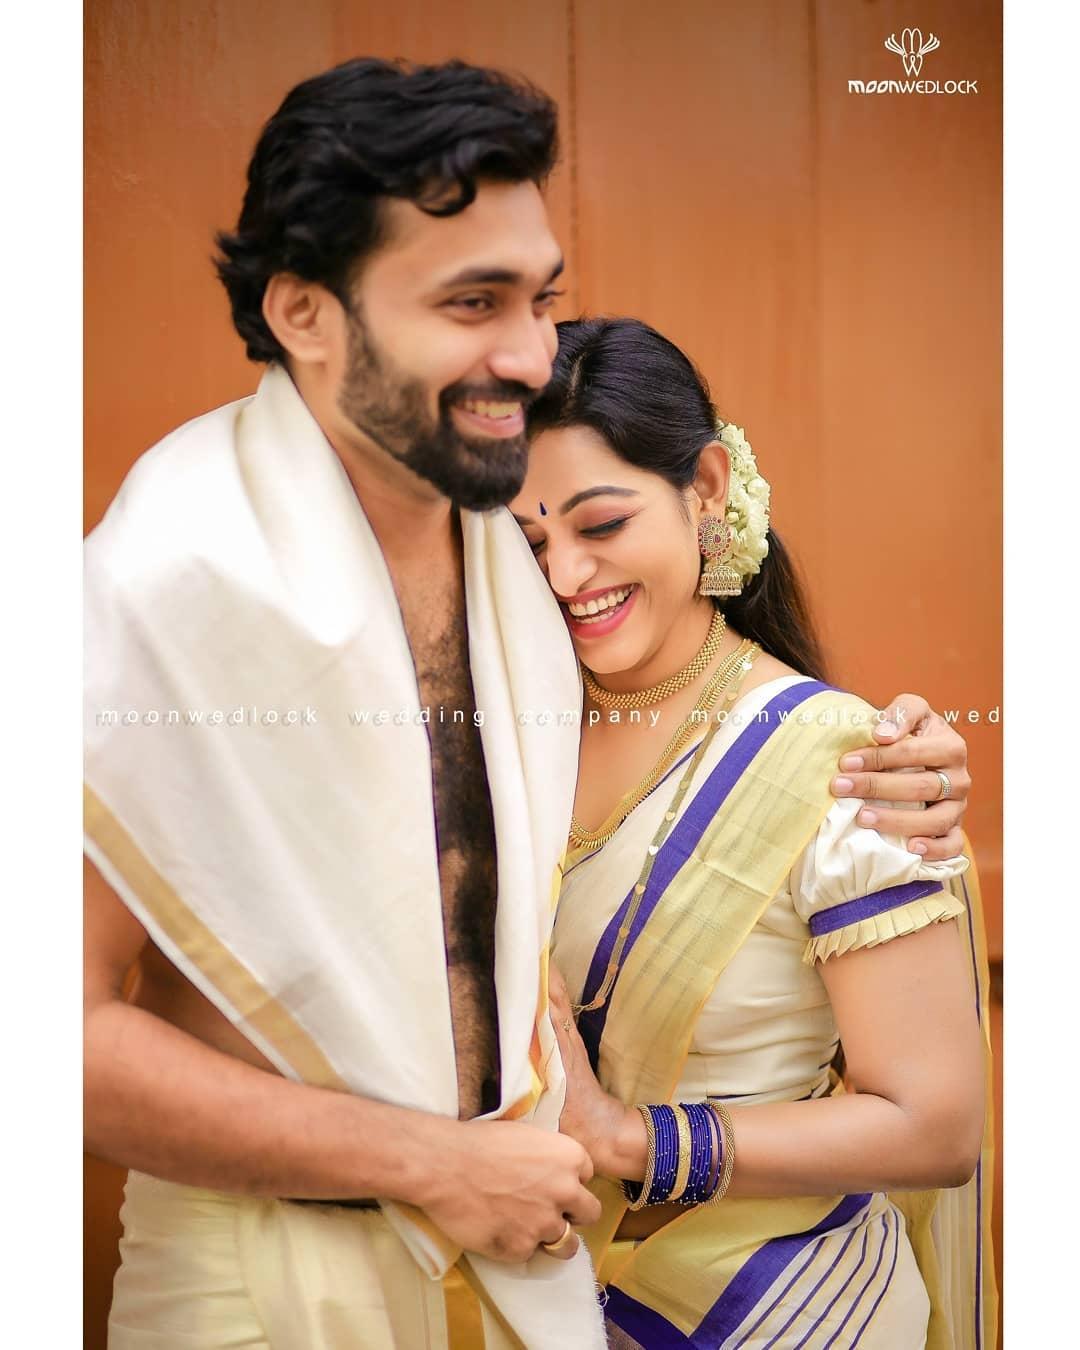 Photos Meera Anil S Wedding Pictures Go Viral News Indiaglitz Com Govind padmasoorya marriage with divya pillai zee keralam mr and mrs latest #gp #govindpadmasoorya #marriage #wedding. photos meera anil s wedding pictures